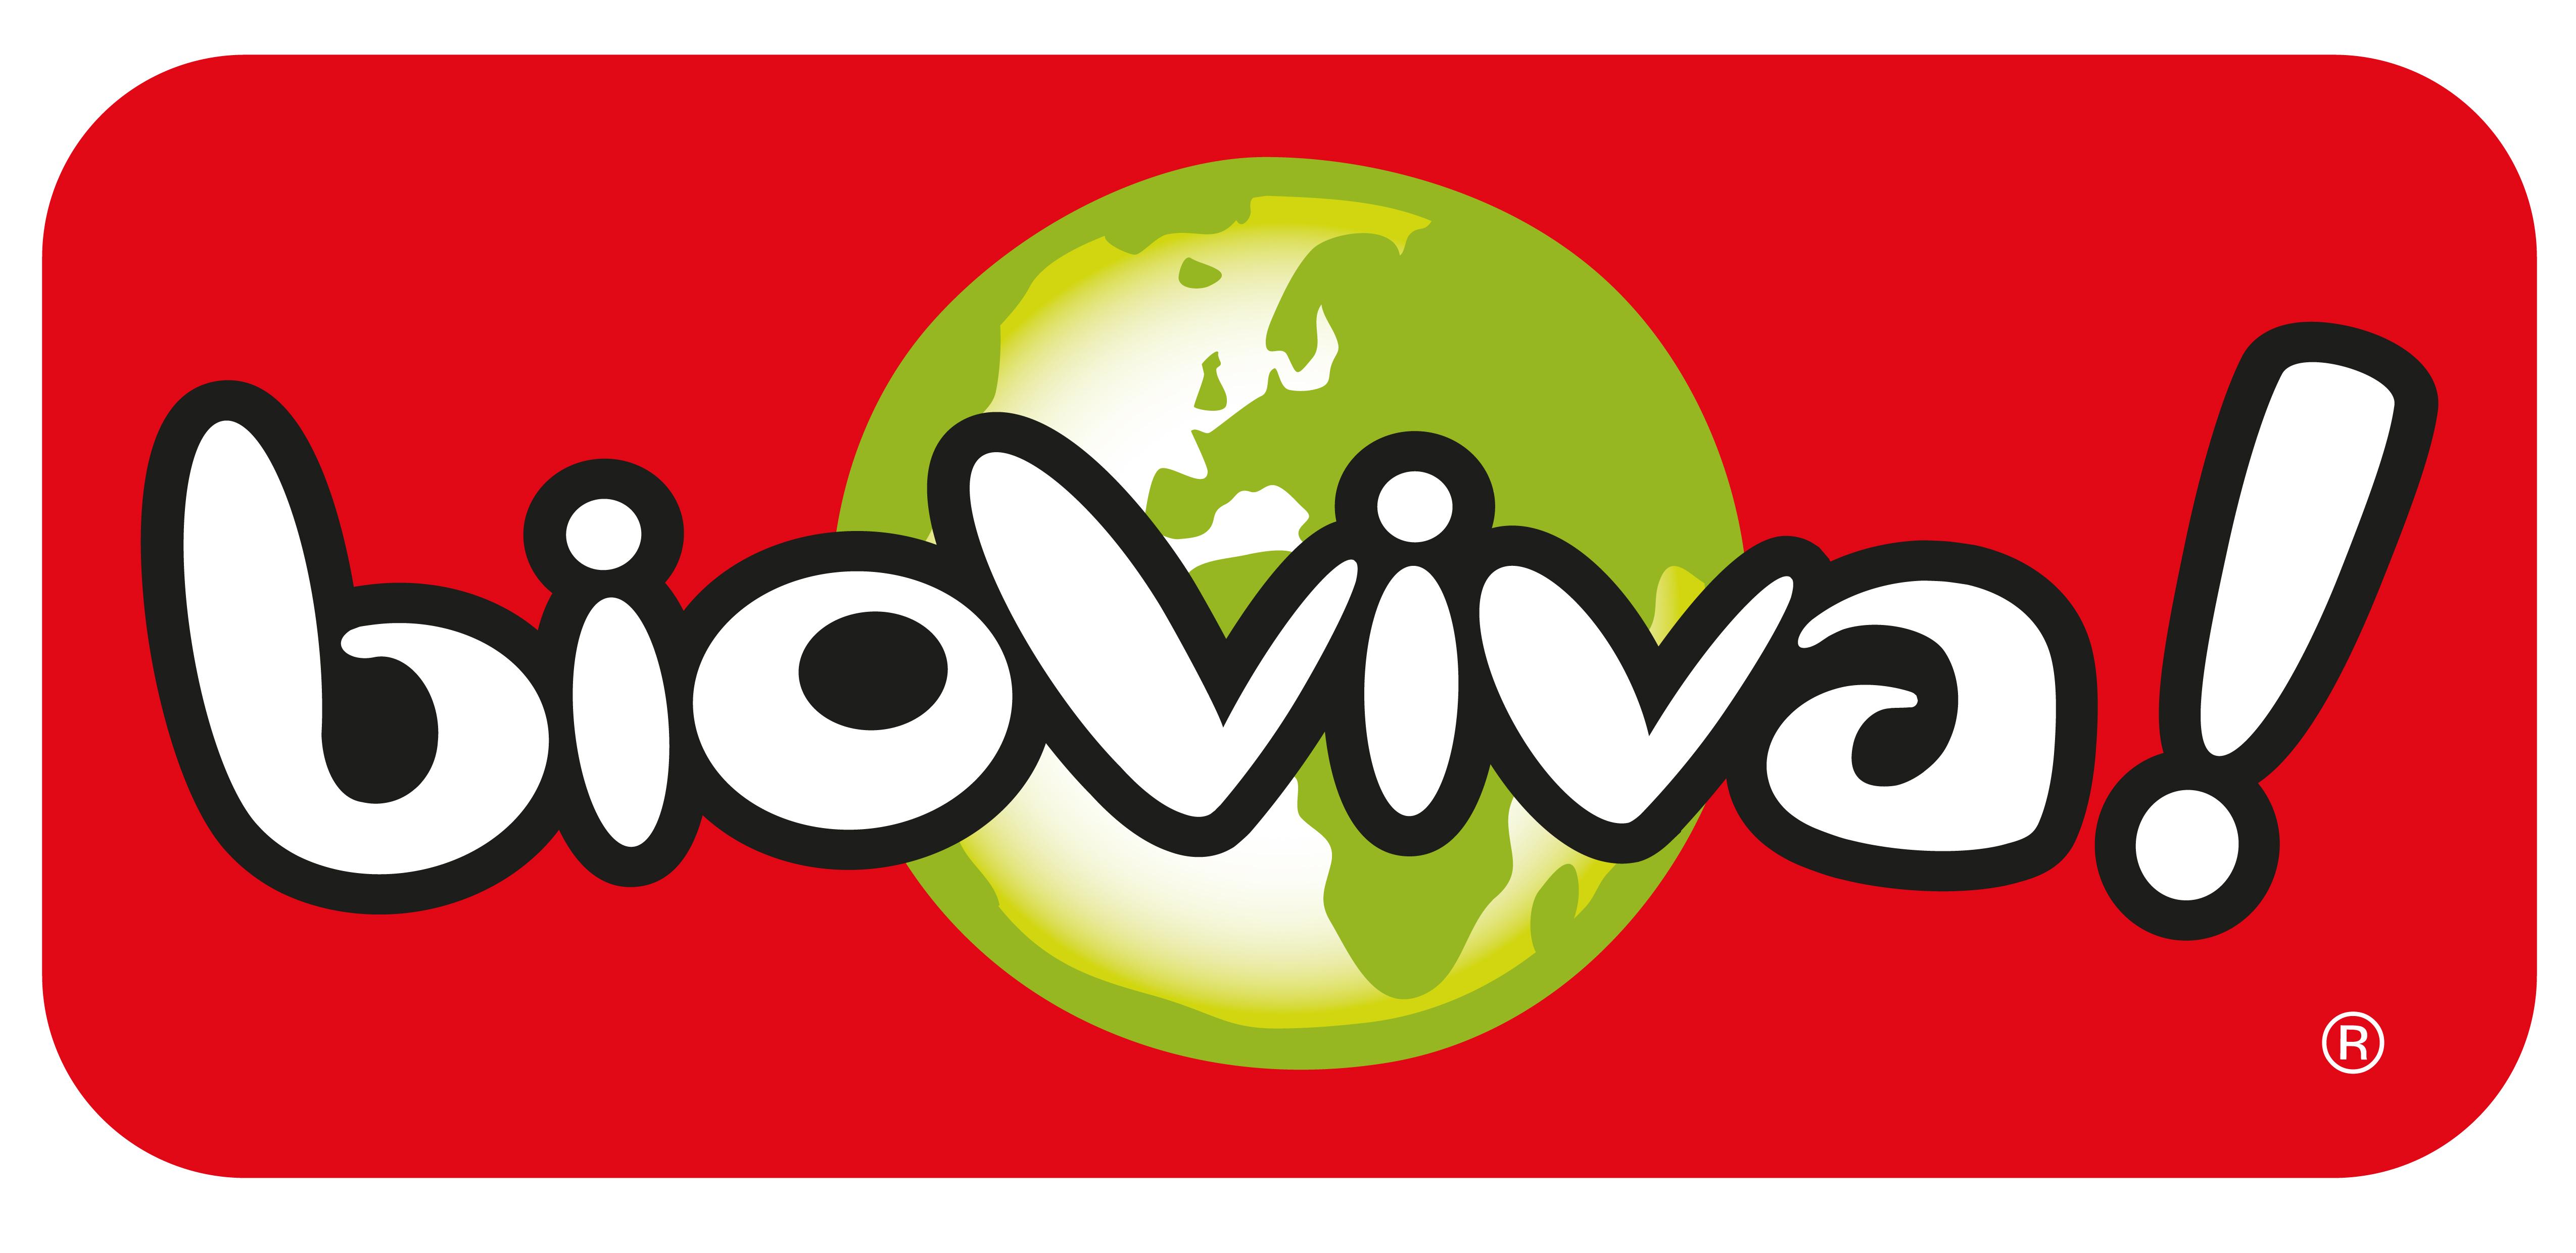 Logo bioviva2014 sans ombre   copie